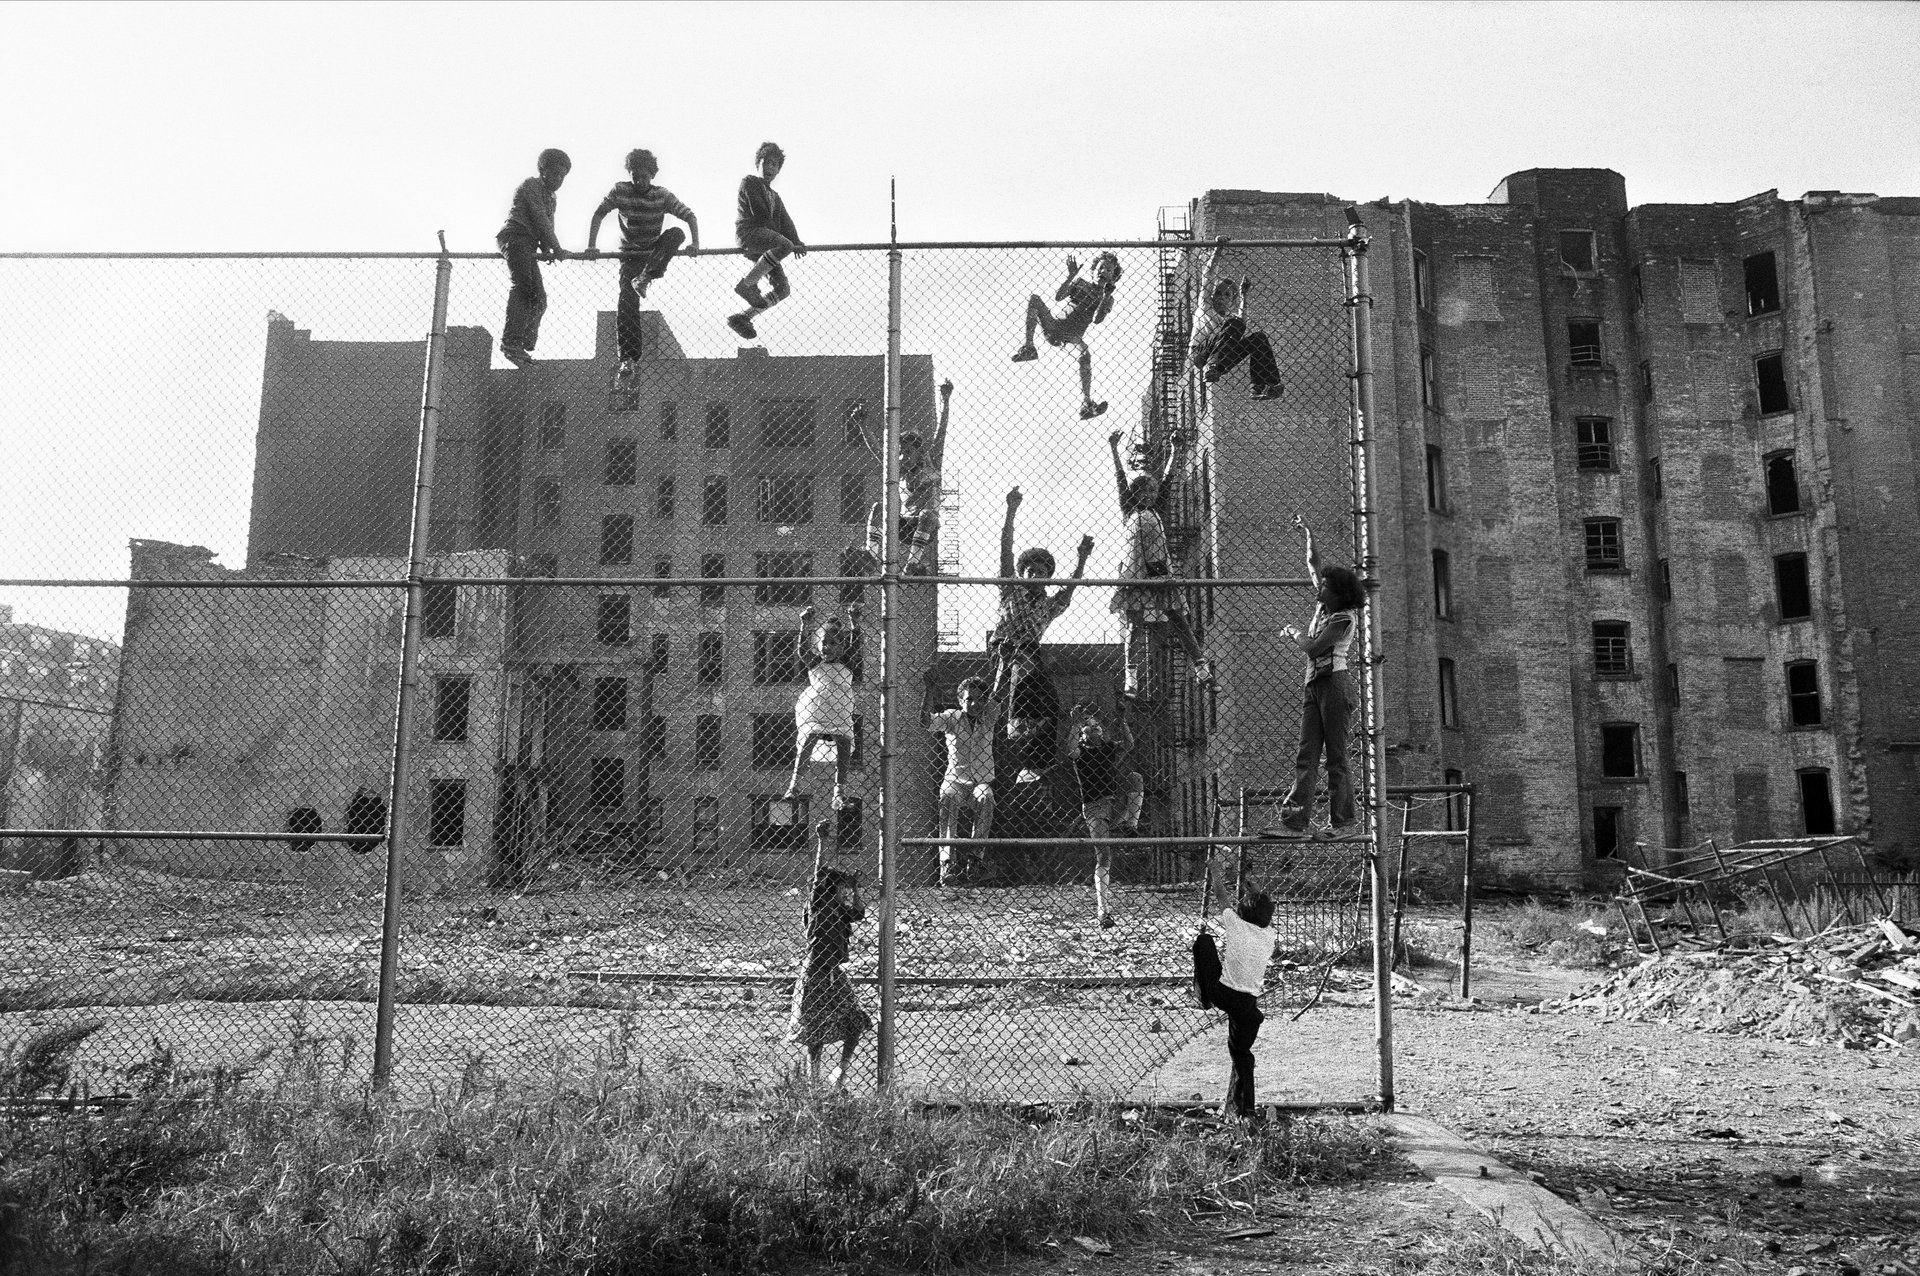 Kids climbing fence, street photography, black and white, Lower East Side, New York (1977-1980) Martha Cooper Cheryl Dunn Everybody Street